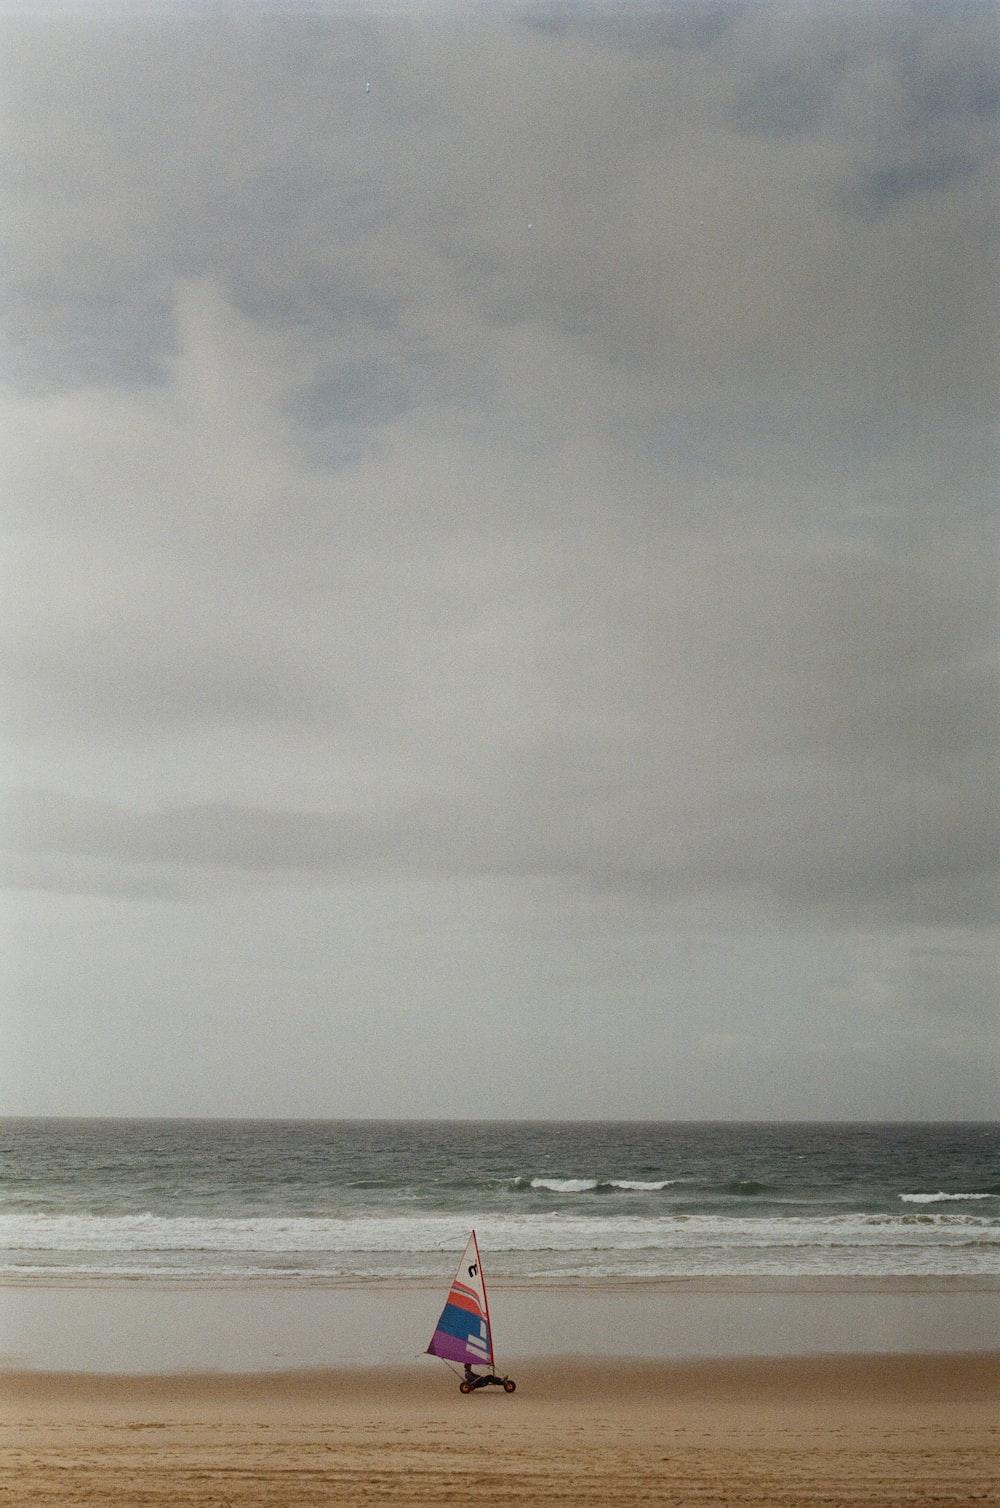 banner on seashore during daytime